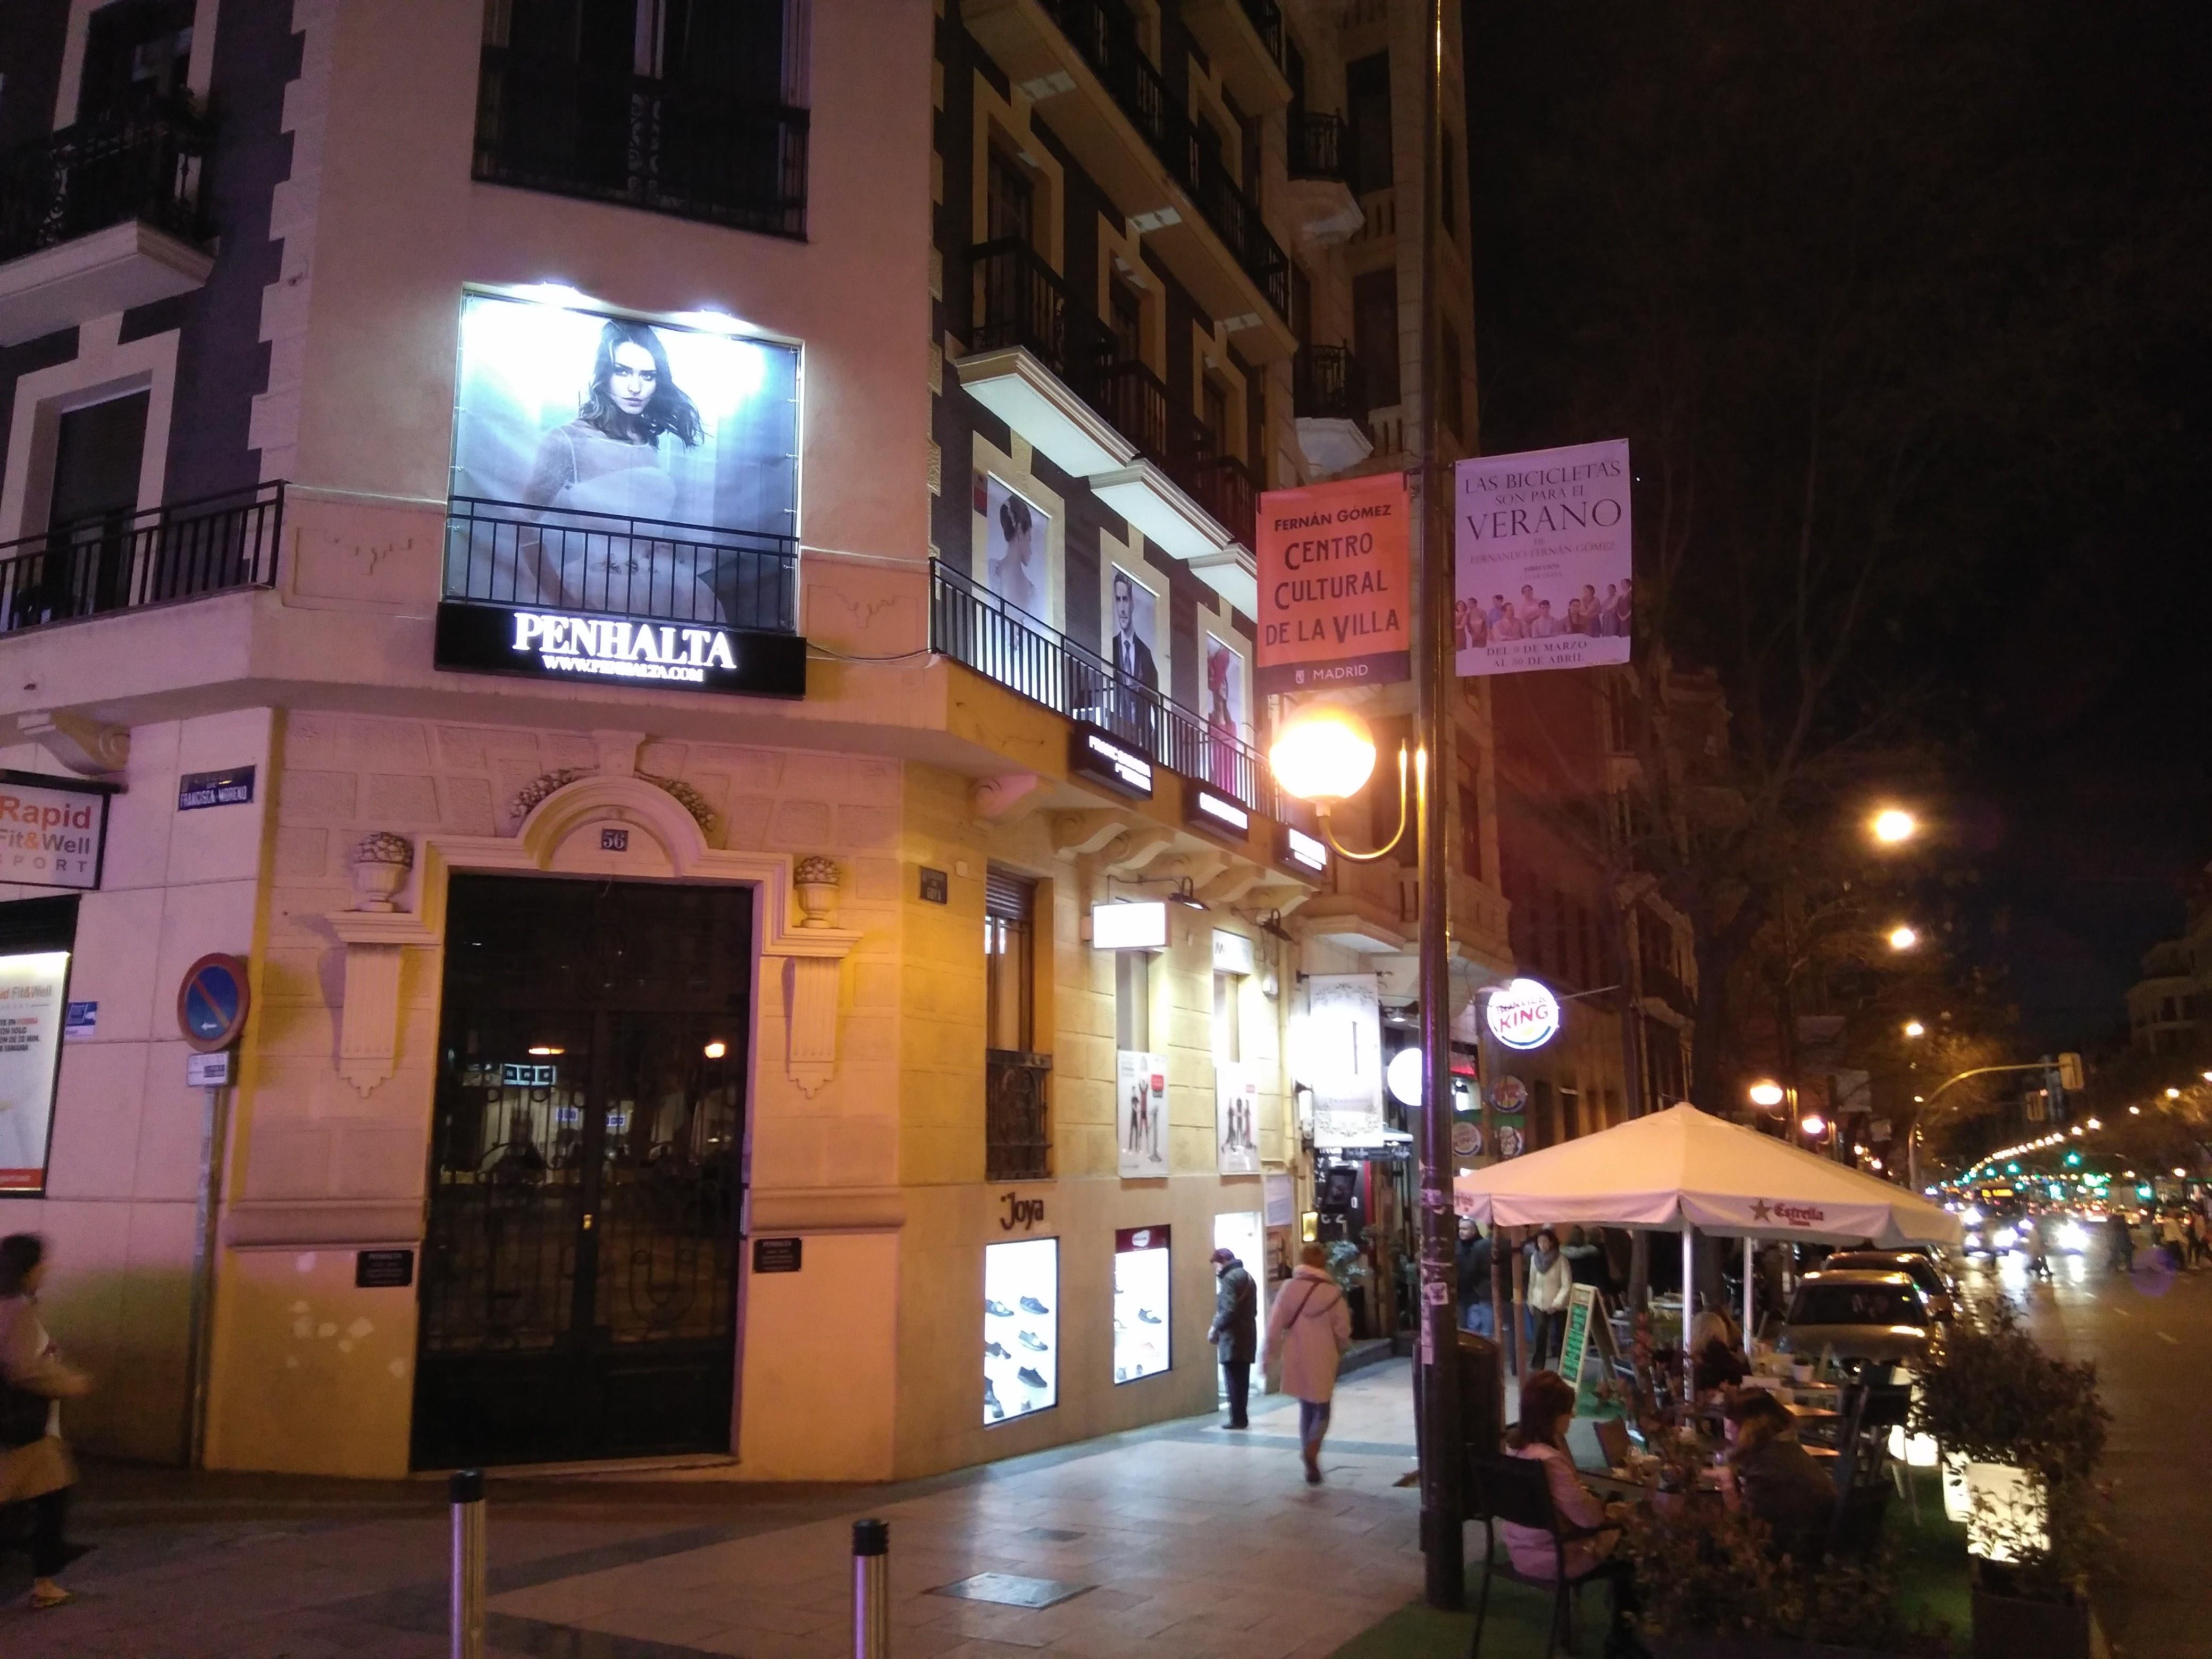 Tienda Madrid Goya